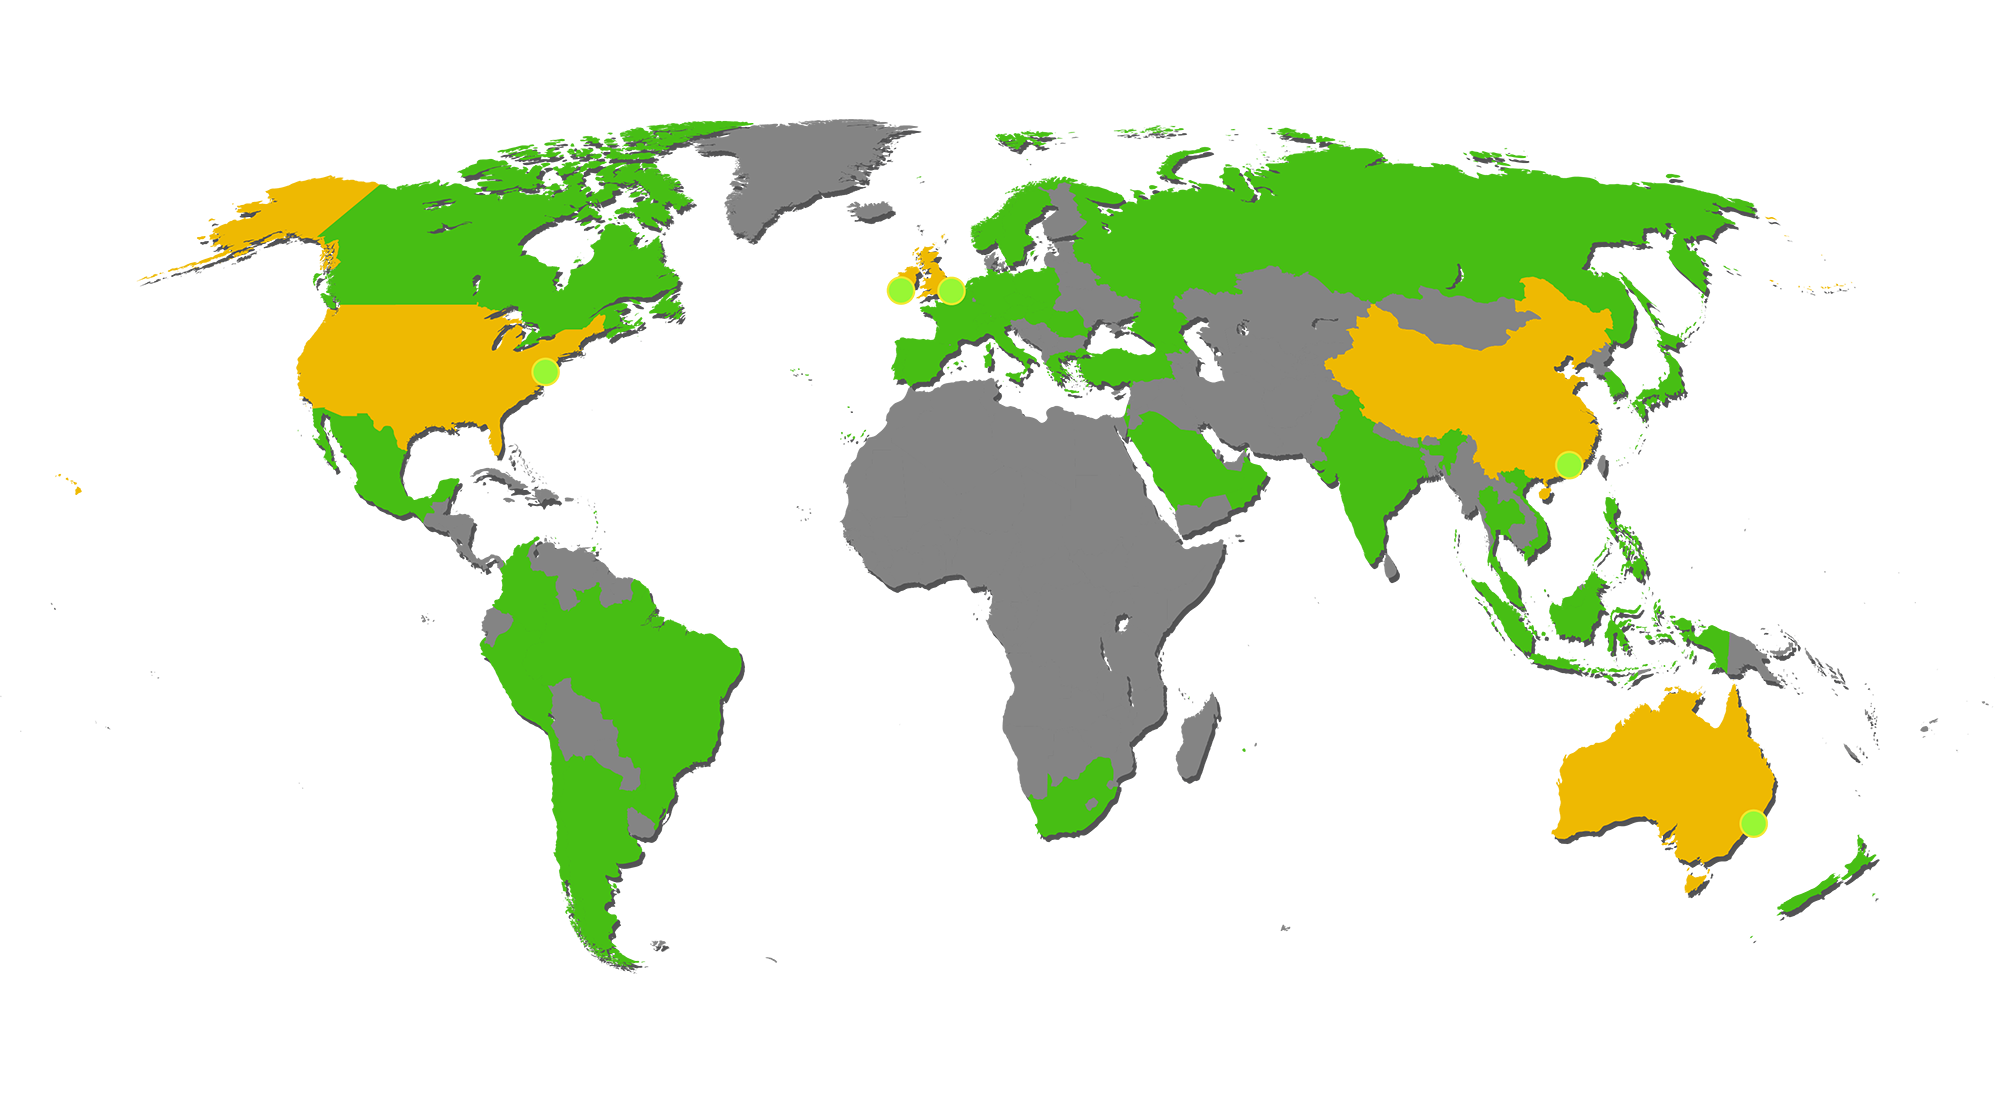 jp reis world map